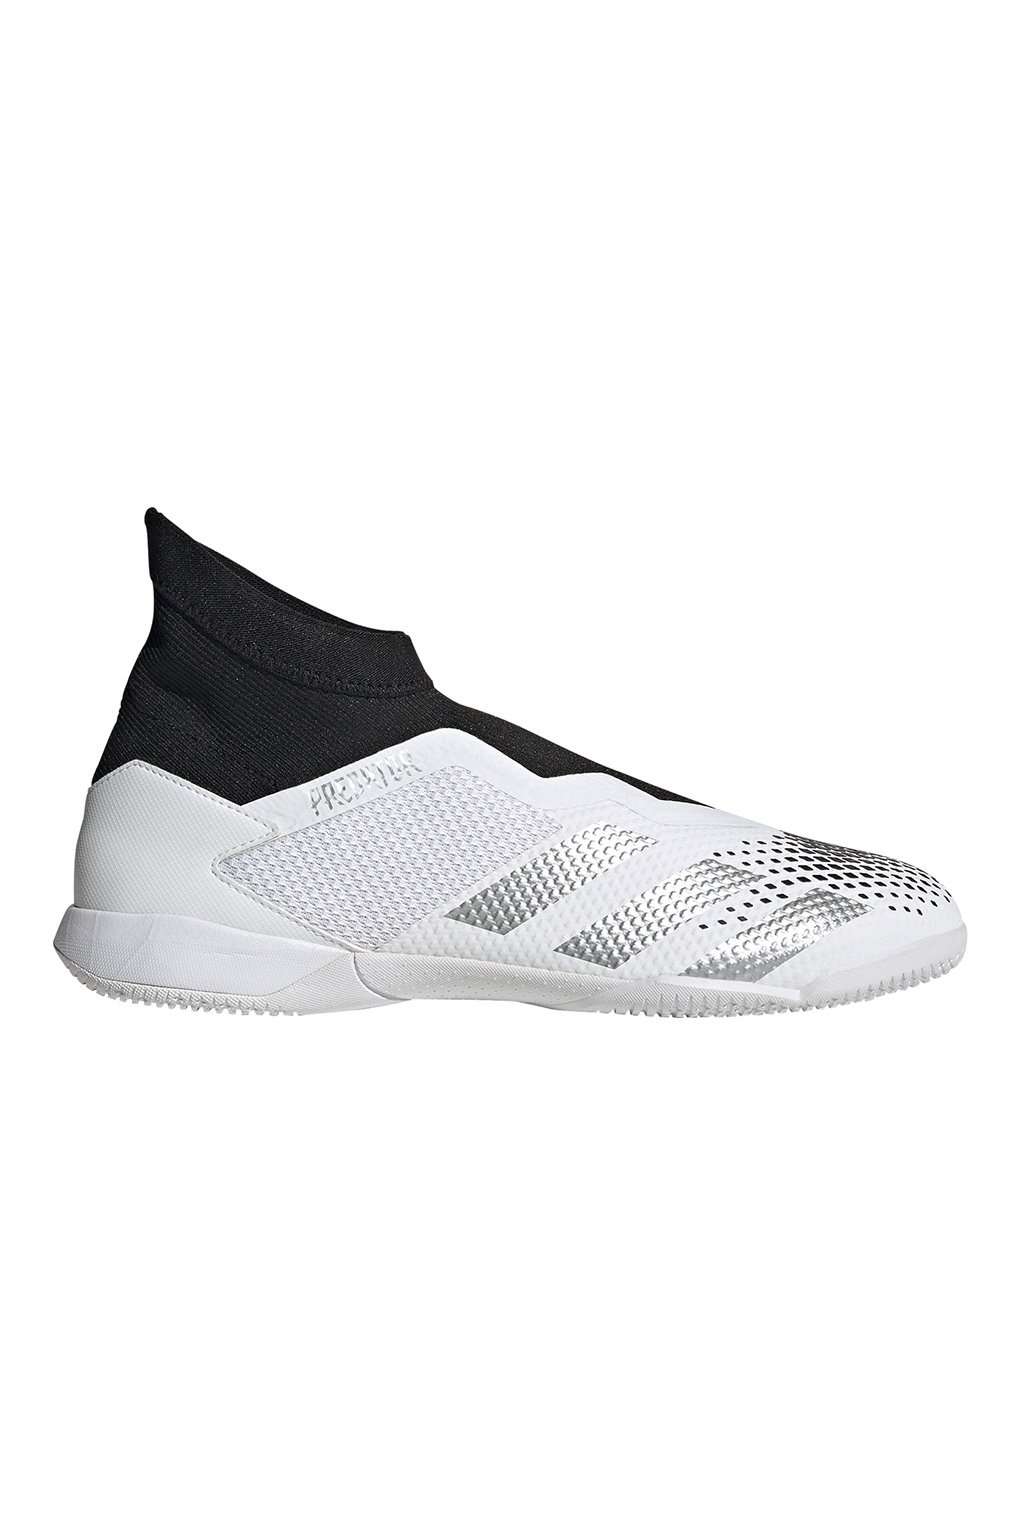 Futbalové kopačky Adidas Predator 20.3 LL IN FW9195